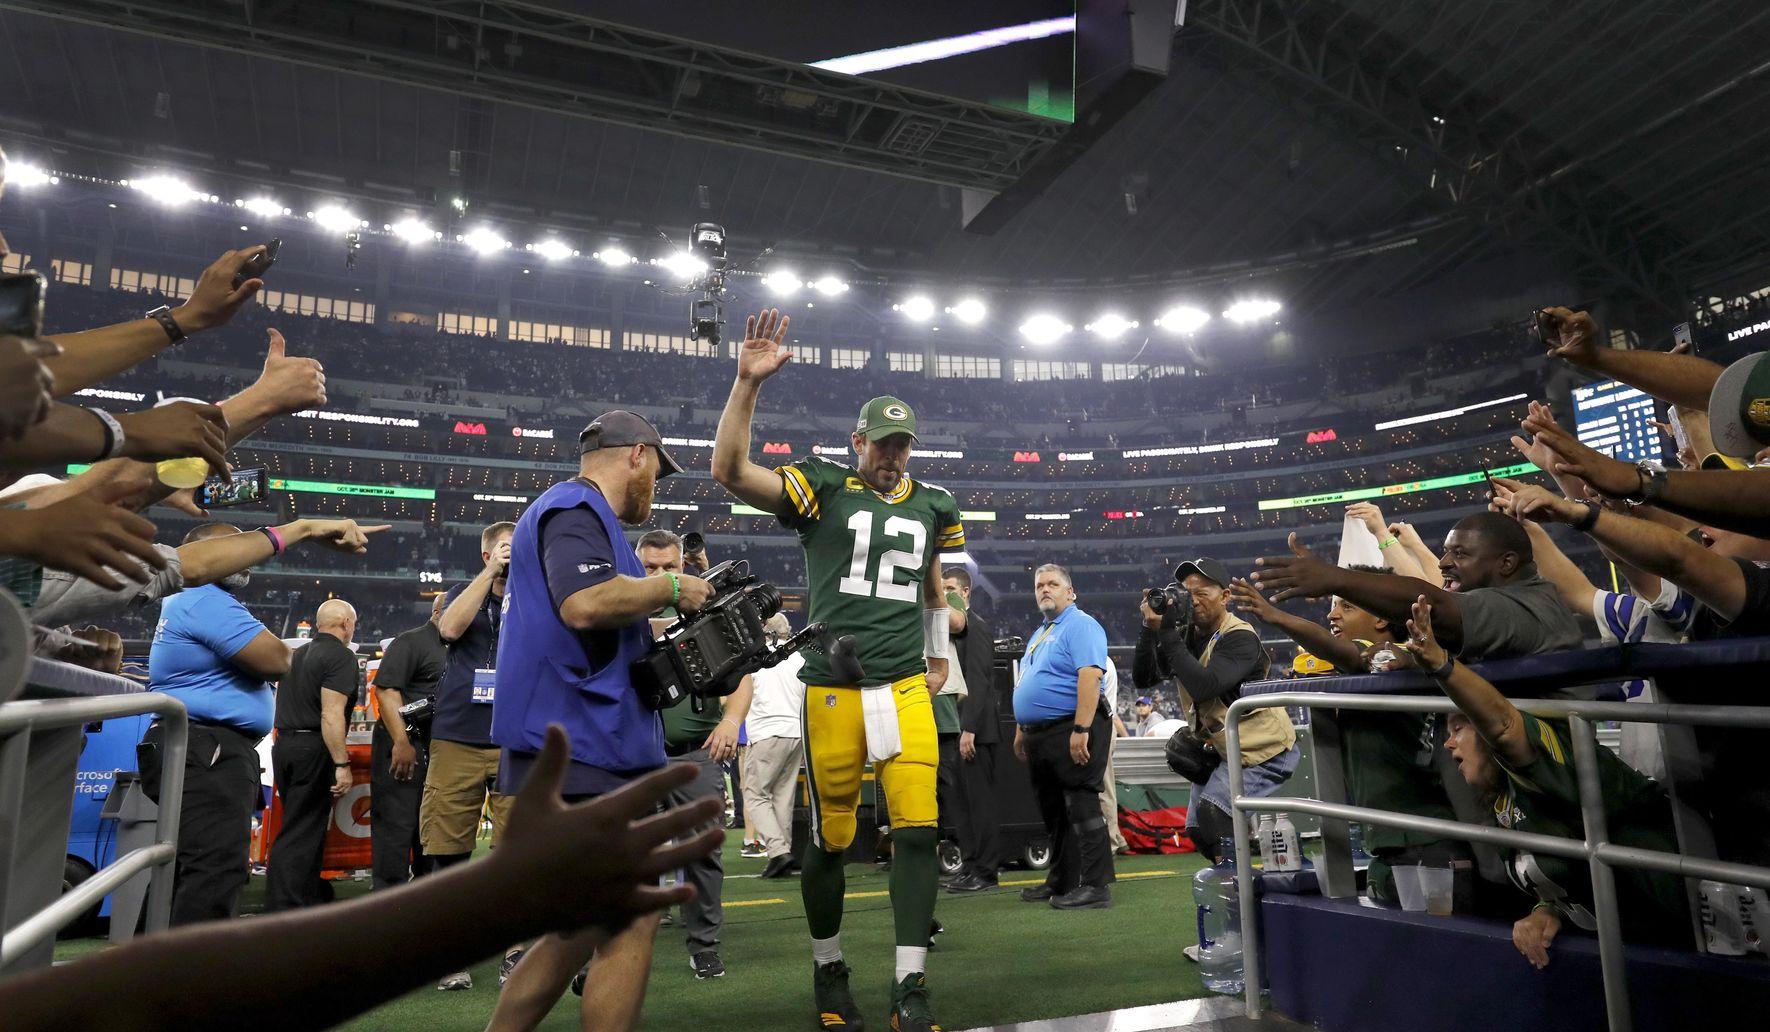 Packers_cowboys_football_14521_c0-190-4542-2838_s1770x1032